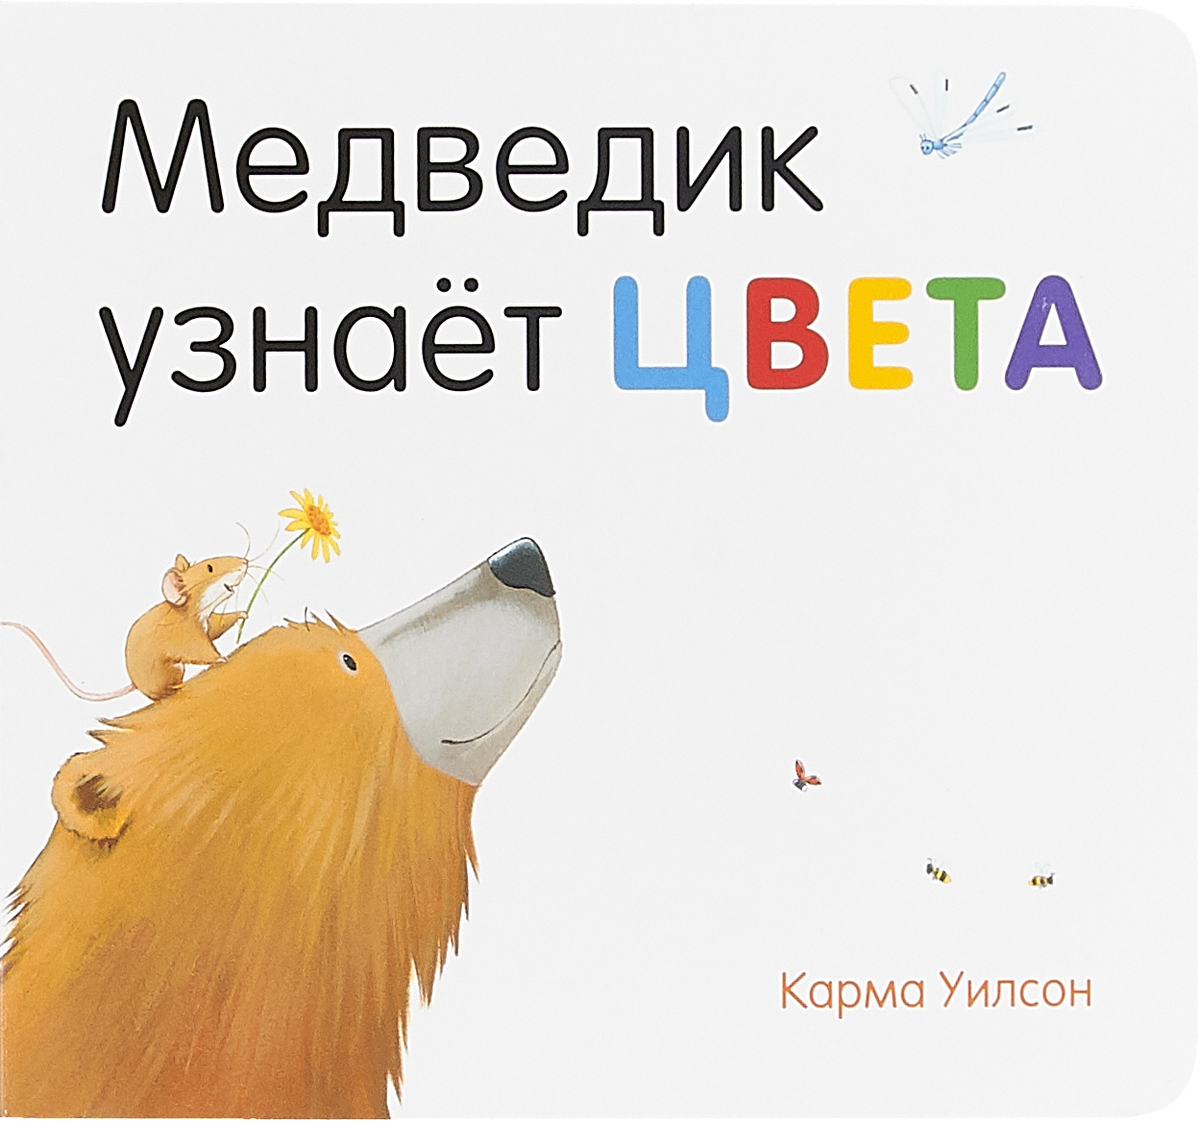 Медведик узнаёт цвета